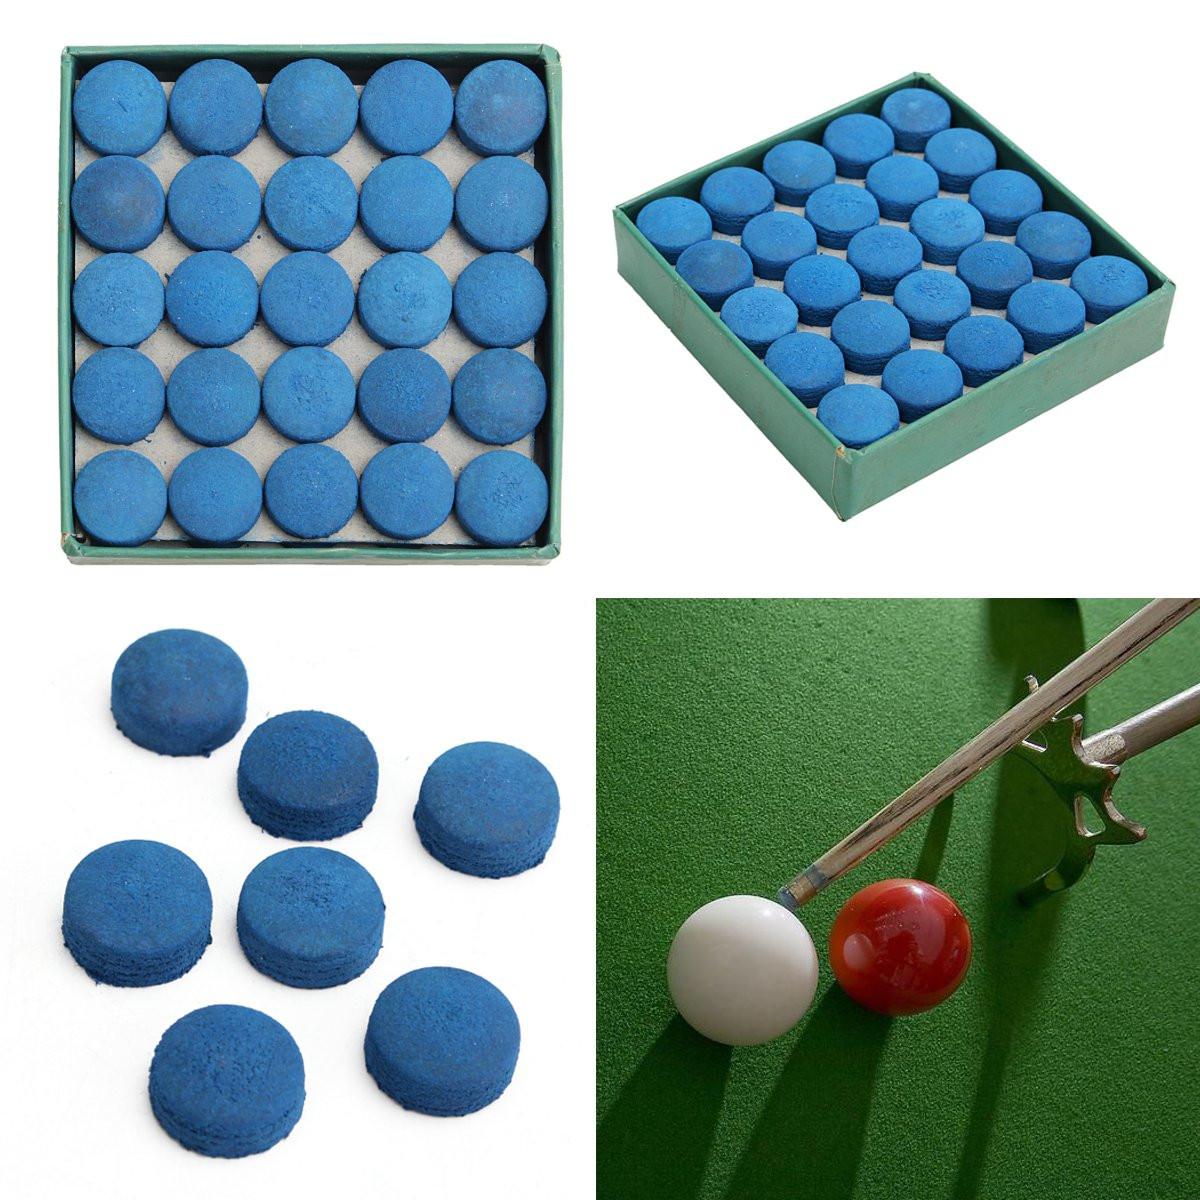 50Pcs Pegamento Piscina Billar cuero azul Cue Tips Caja Juego Sport 9mm 10mm 13mm